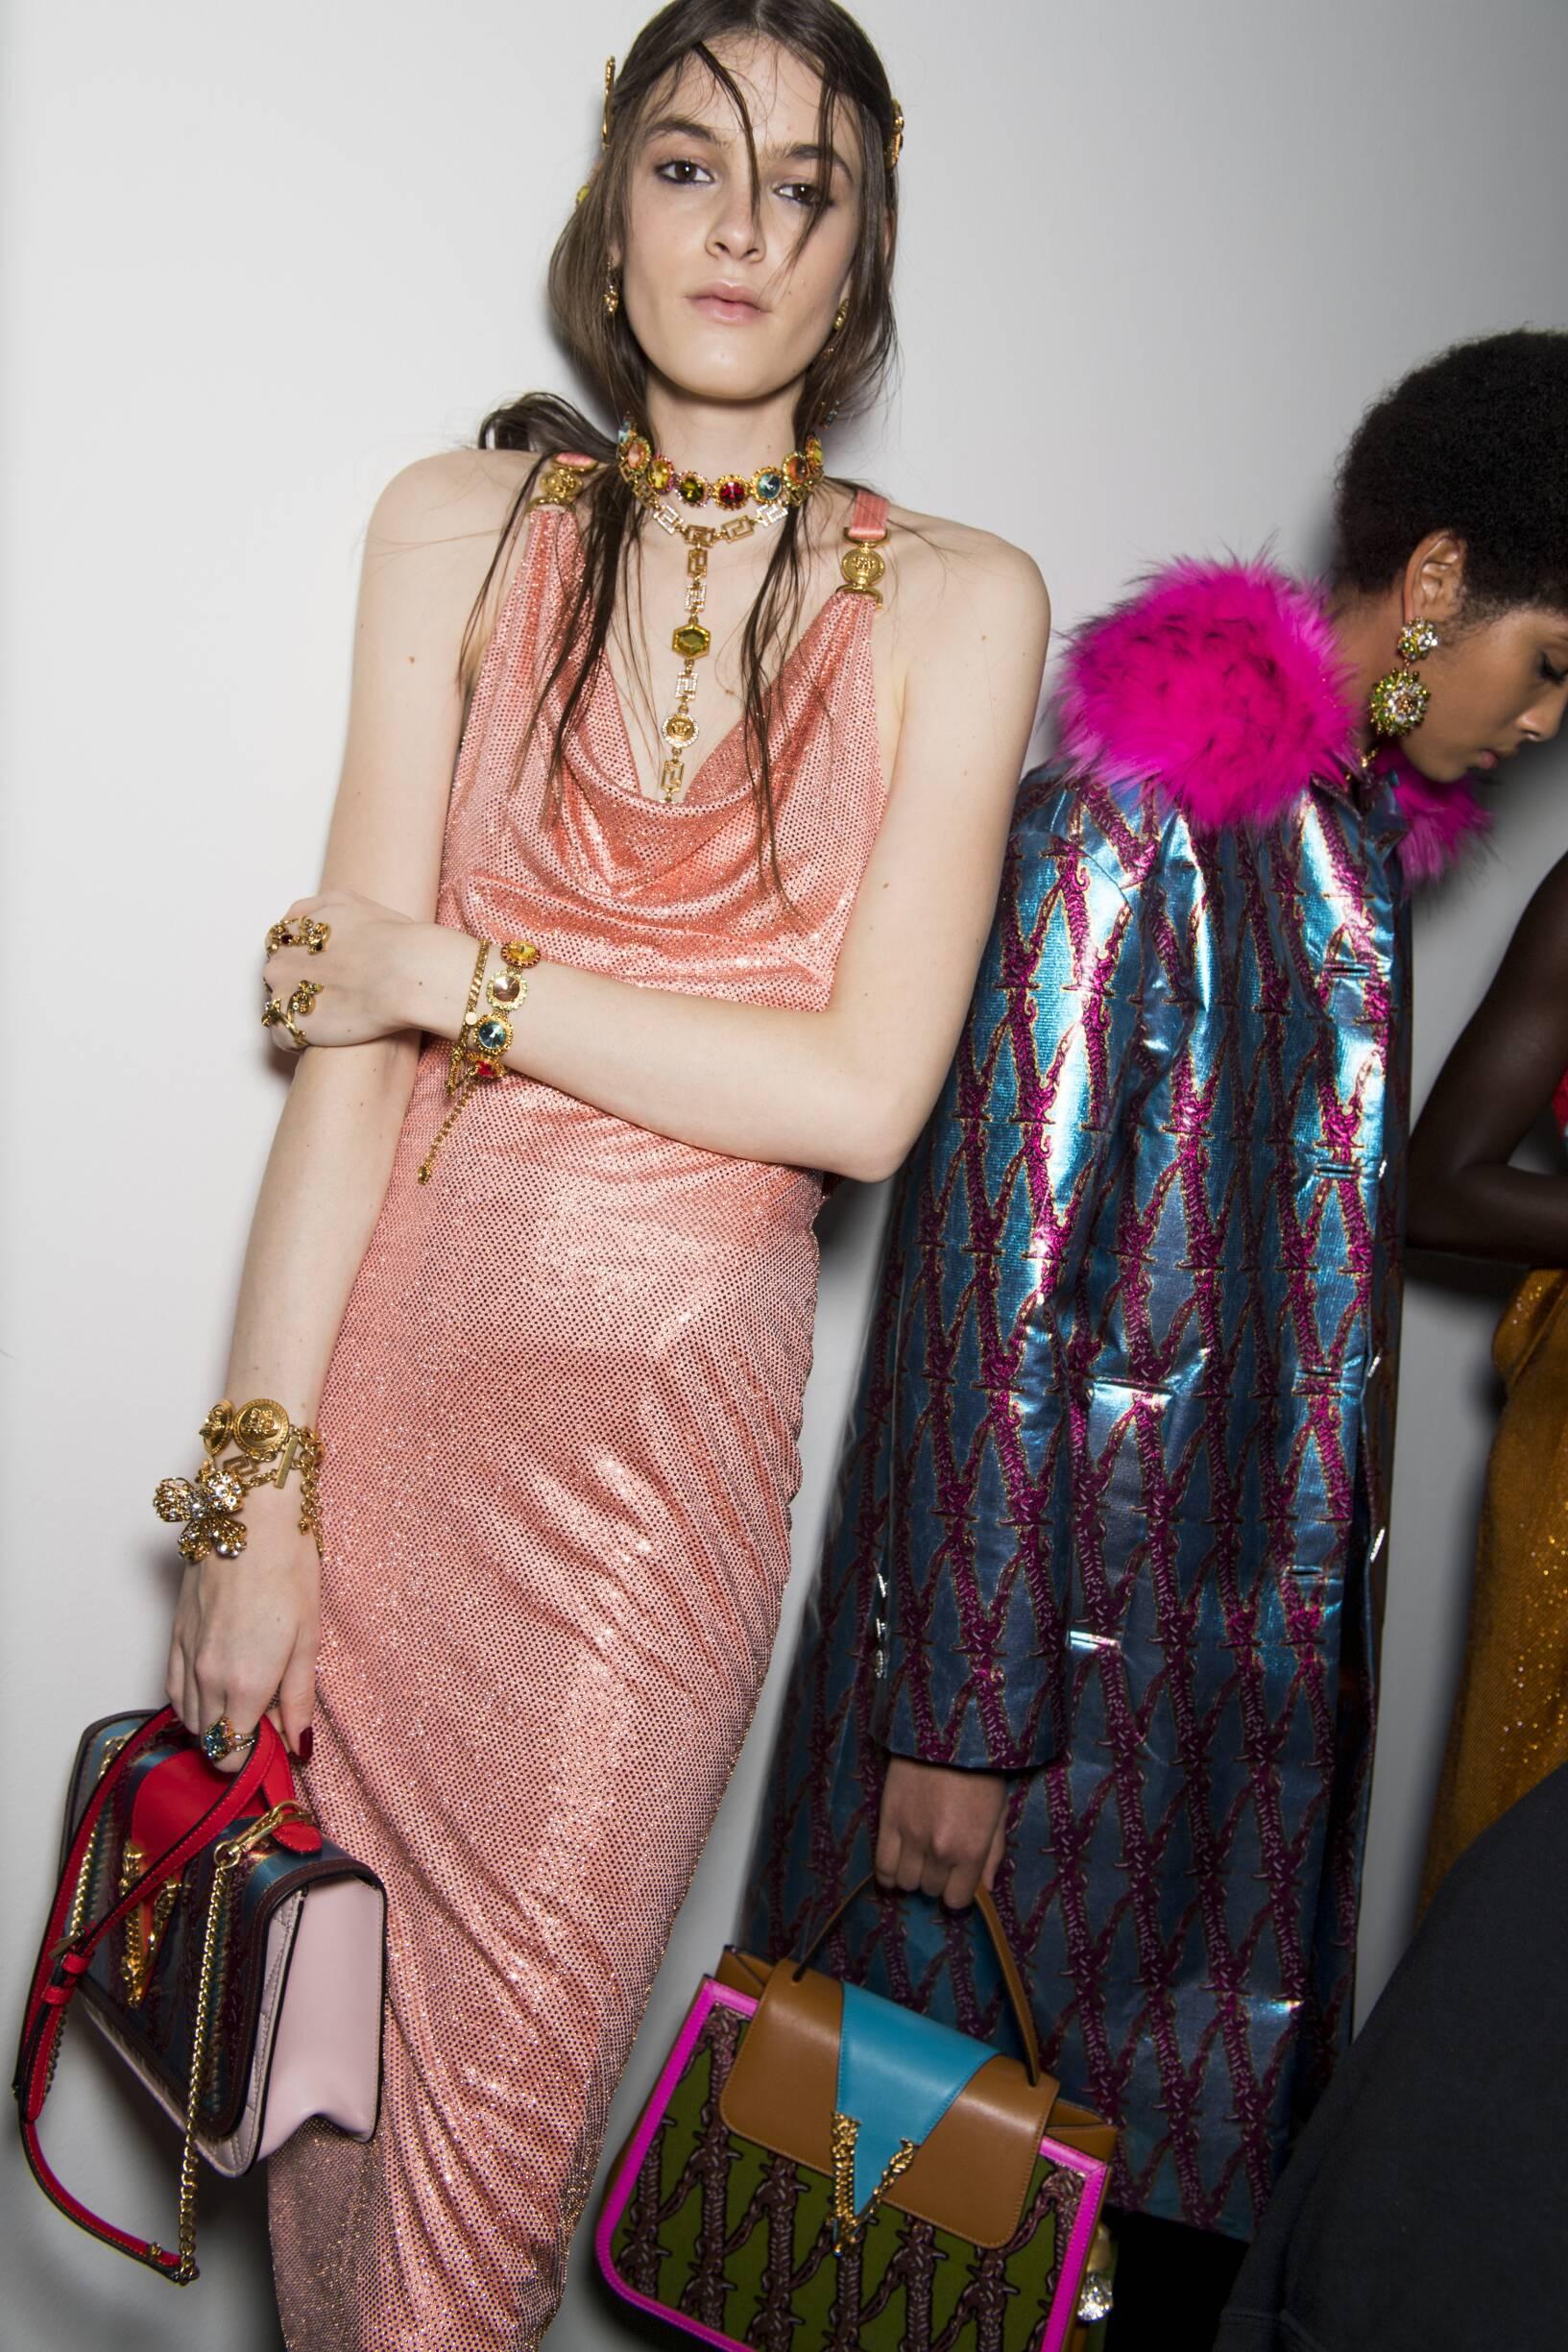 Models 2019 Fashion Backstage Versace